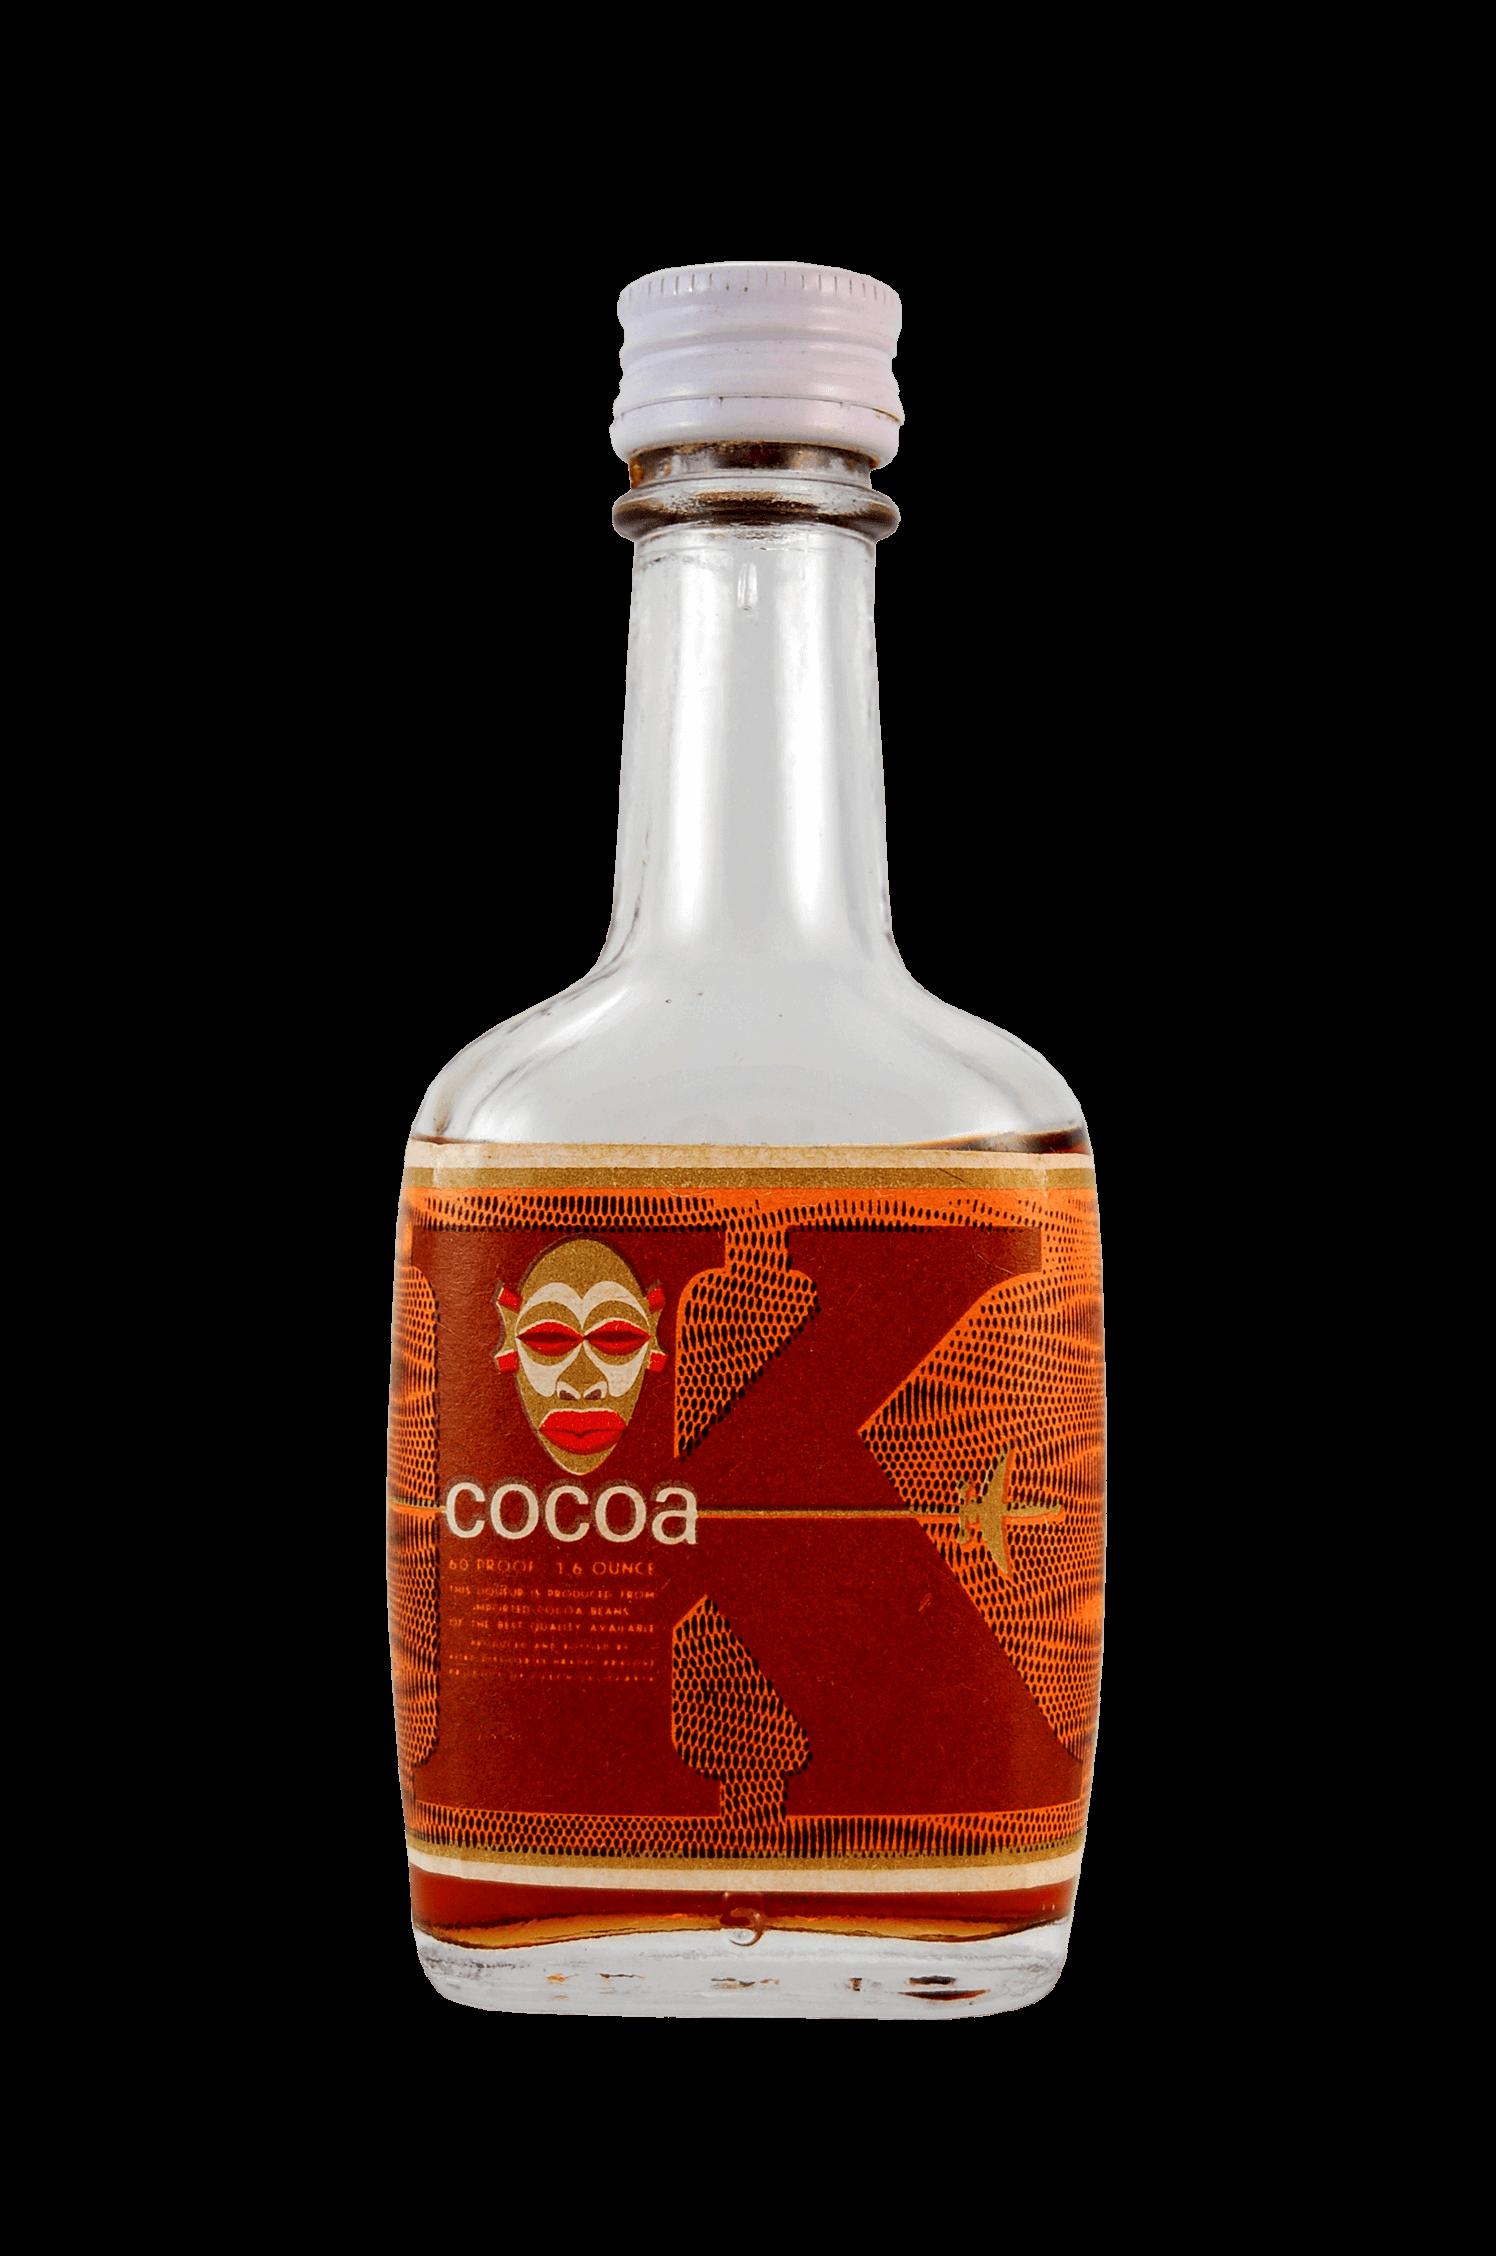 Kord Cocoa